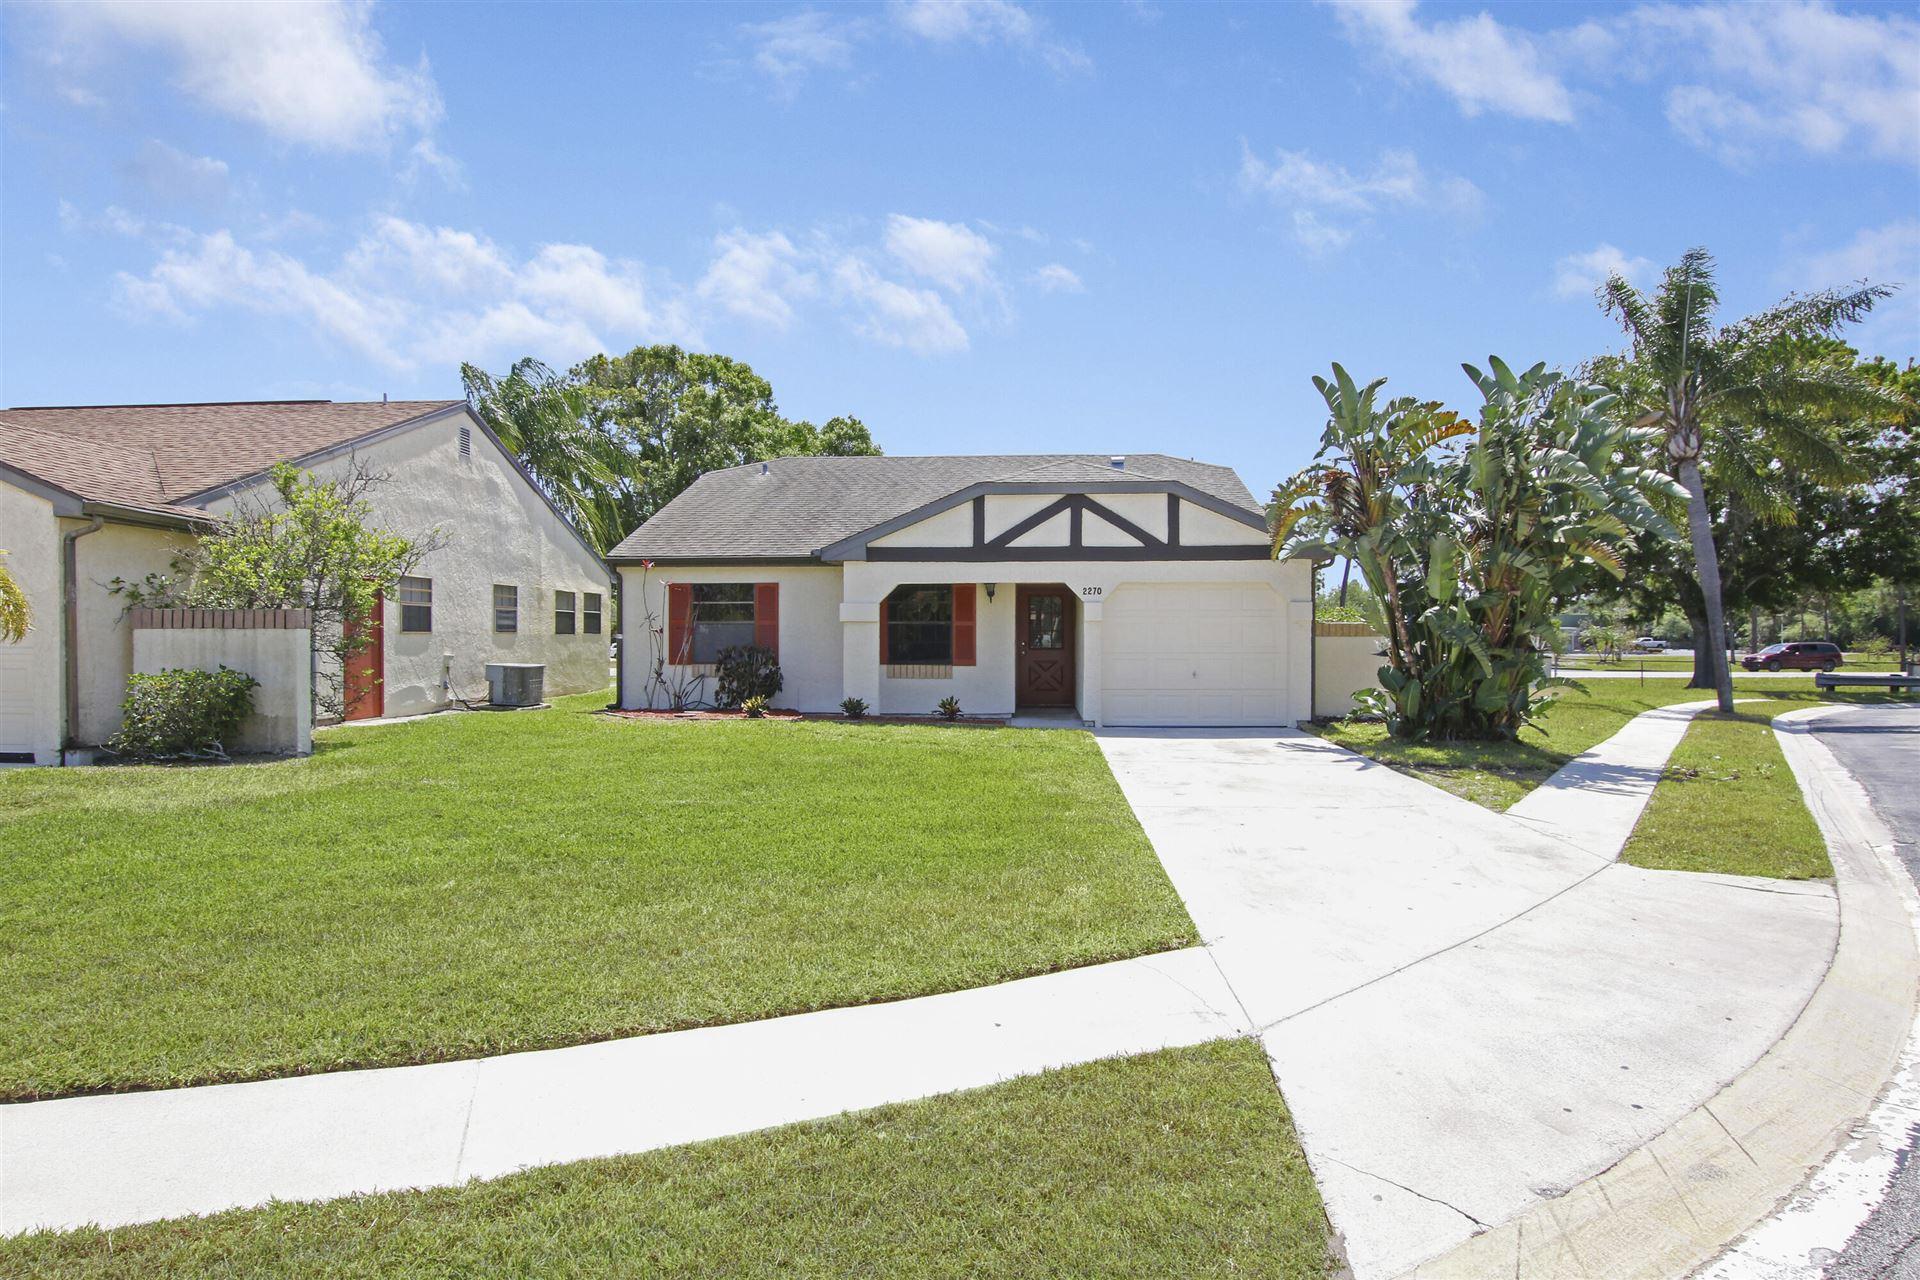 2270 SE Breckenridge Circle, Port Saint Lucie, FL 34952 - #: RX-10707656